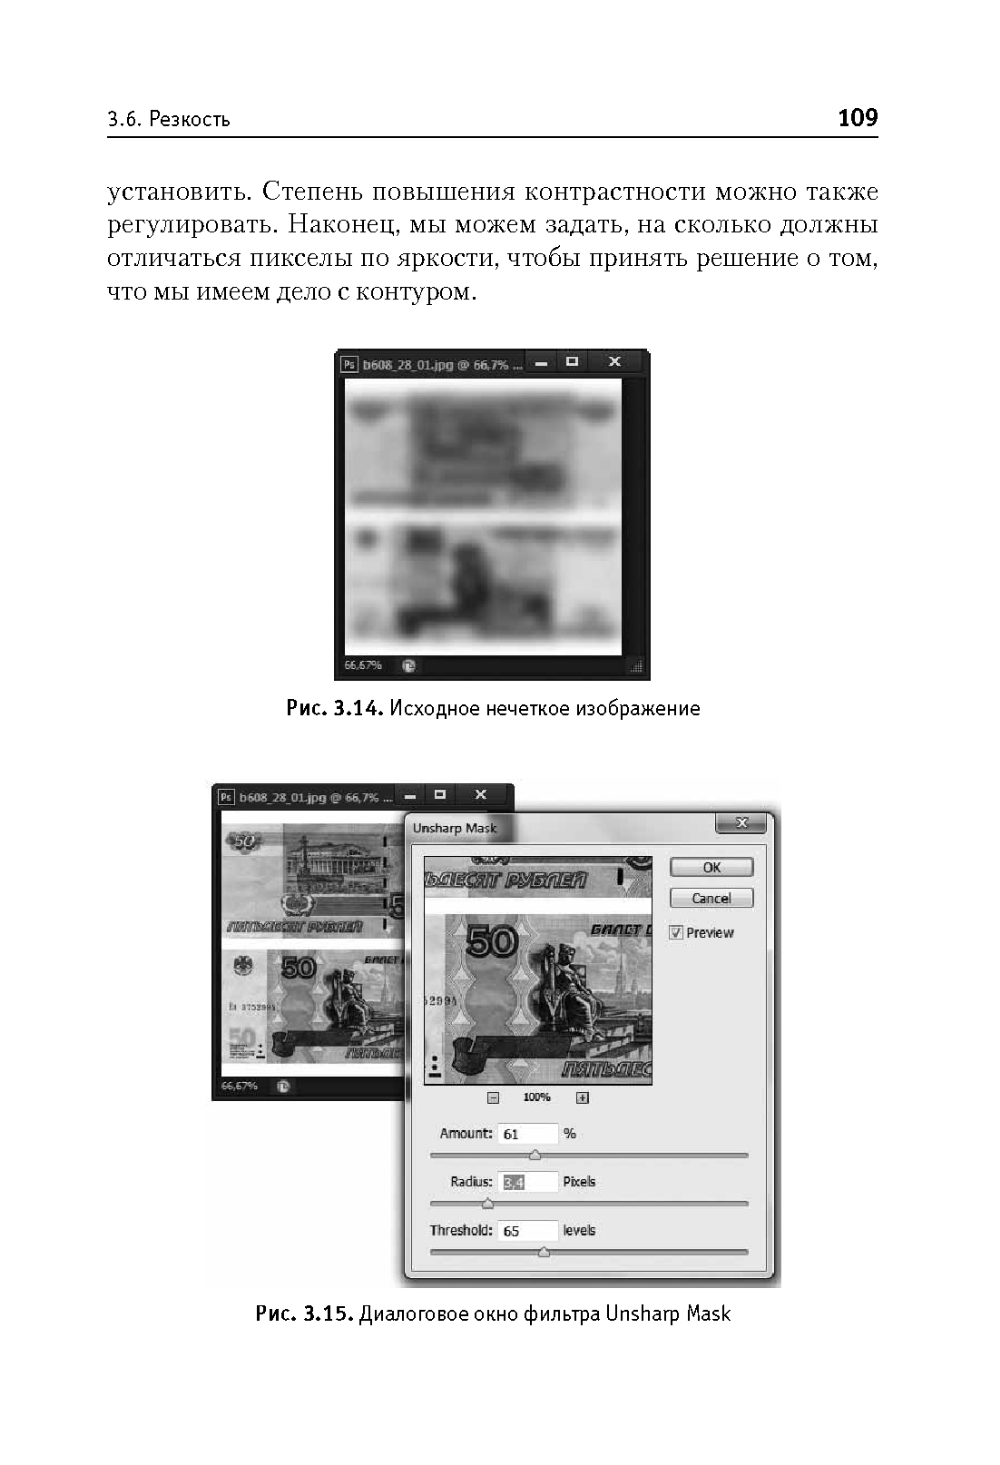 http://i5.imageban.ru/out/2013/11/10/f43231429b2cc048eb1b6b94bddd664b.jpg